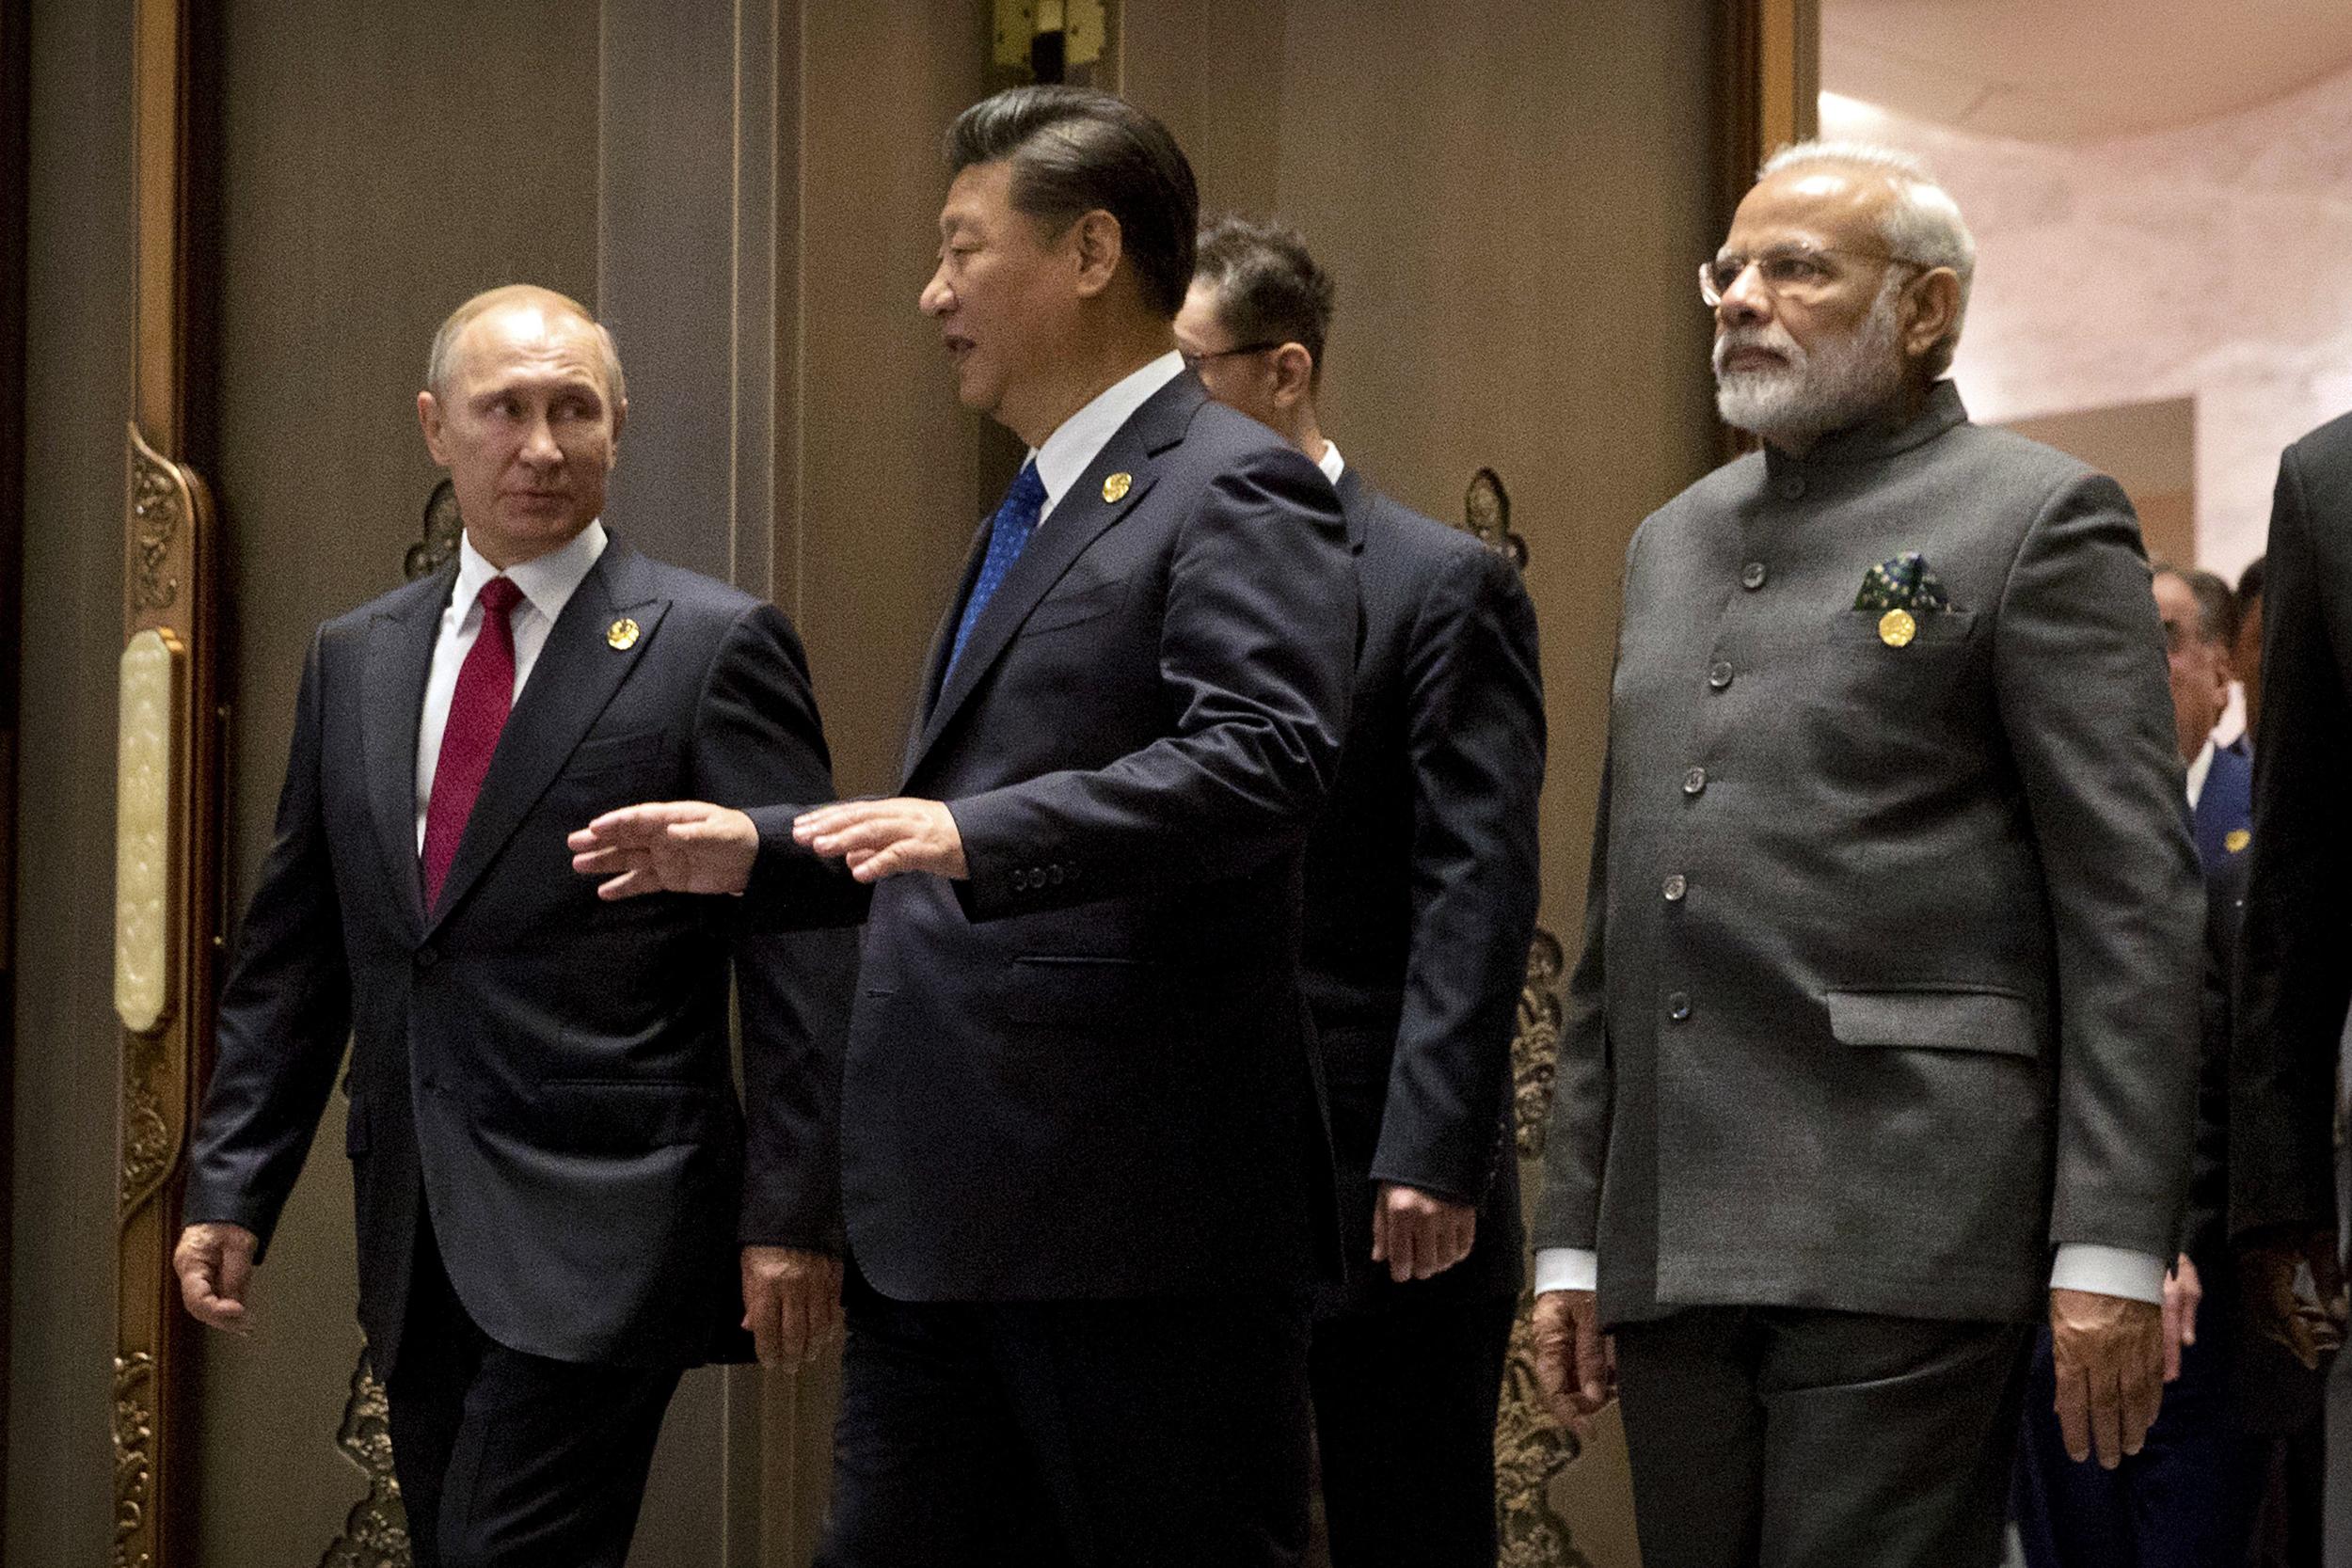 Image: Russian President Vladimir Putin, Chinese President Xi Jinping and Indian Prime Minister Narendra Modi